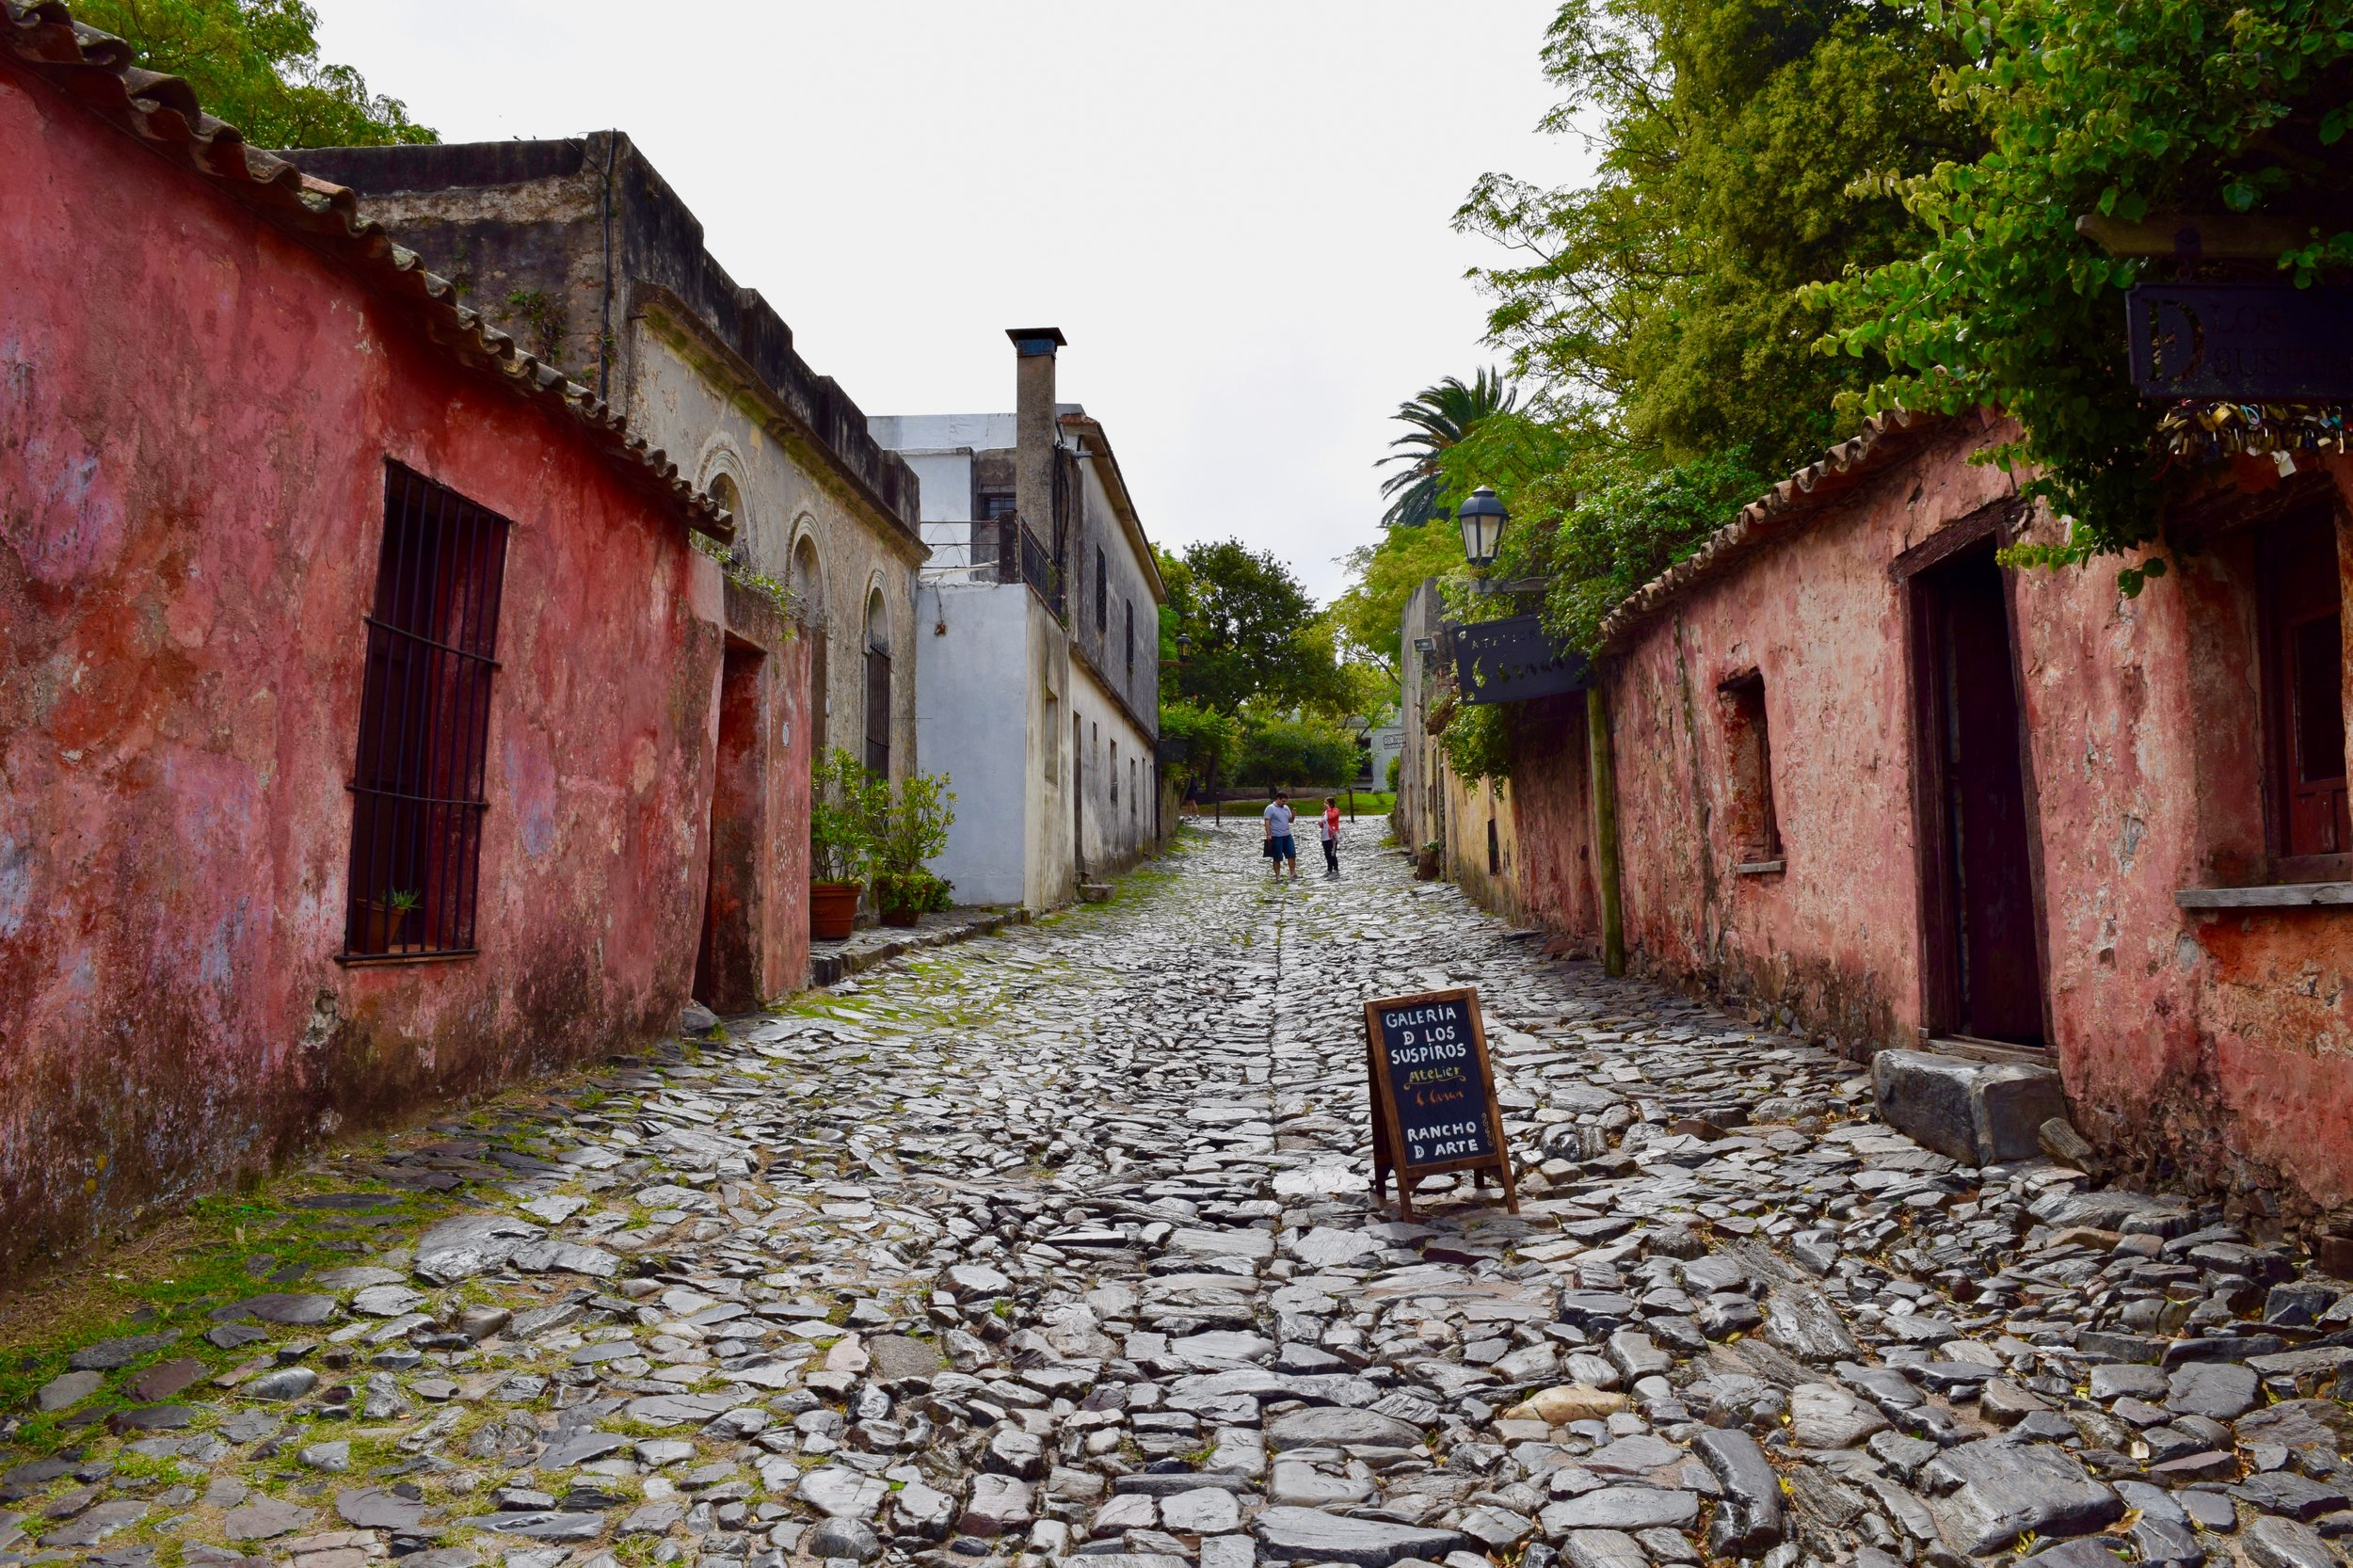 Rua dos Suspiros